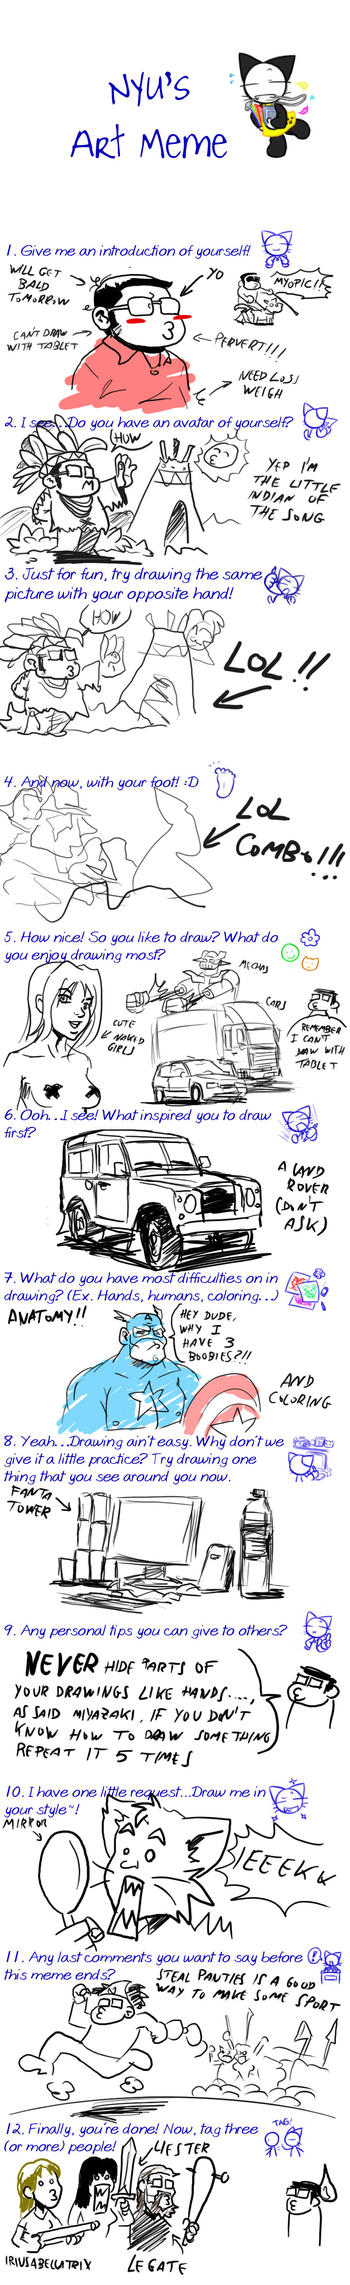 Art Meme pantsu-pantsu by Pablocomics